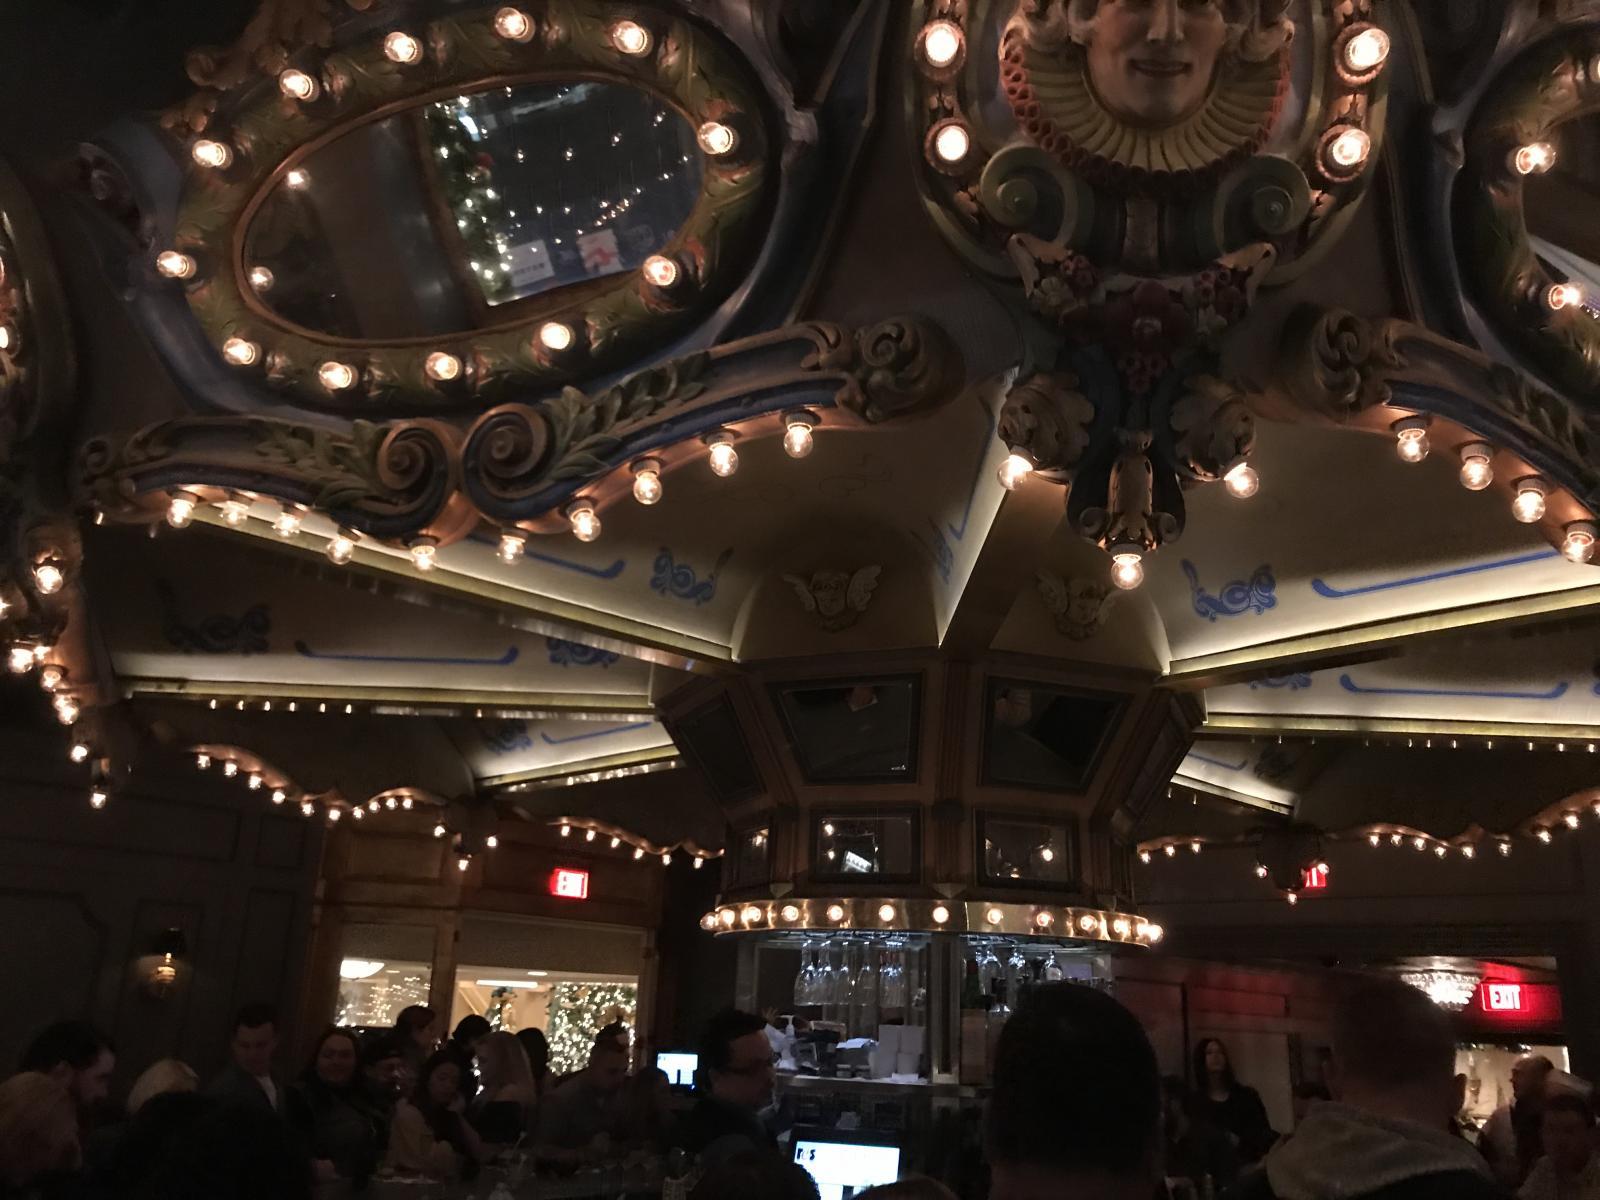 Carousel Bar New Orleans 2017